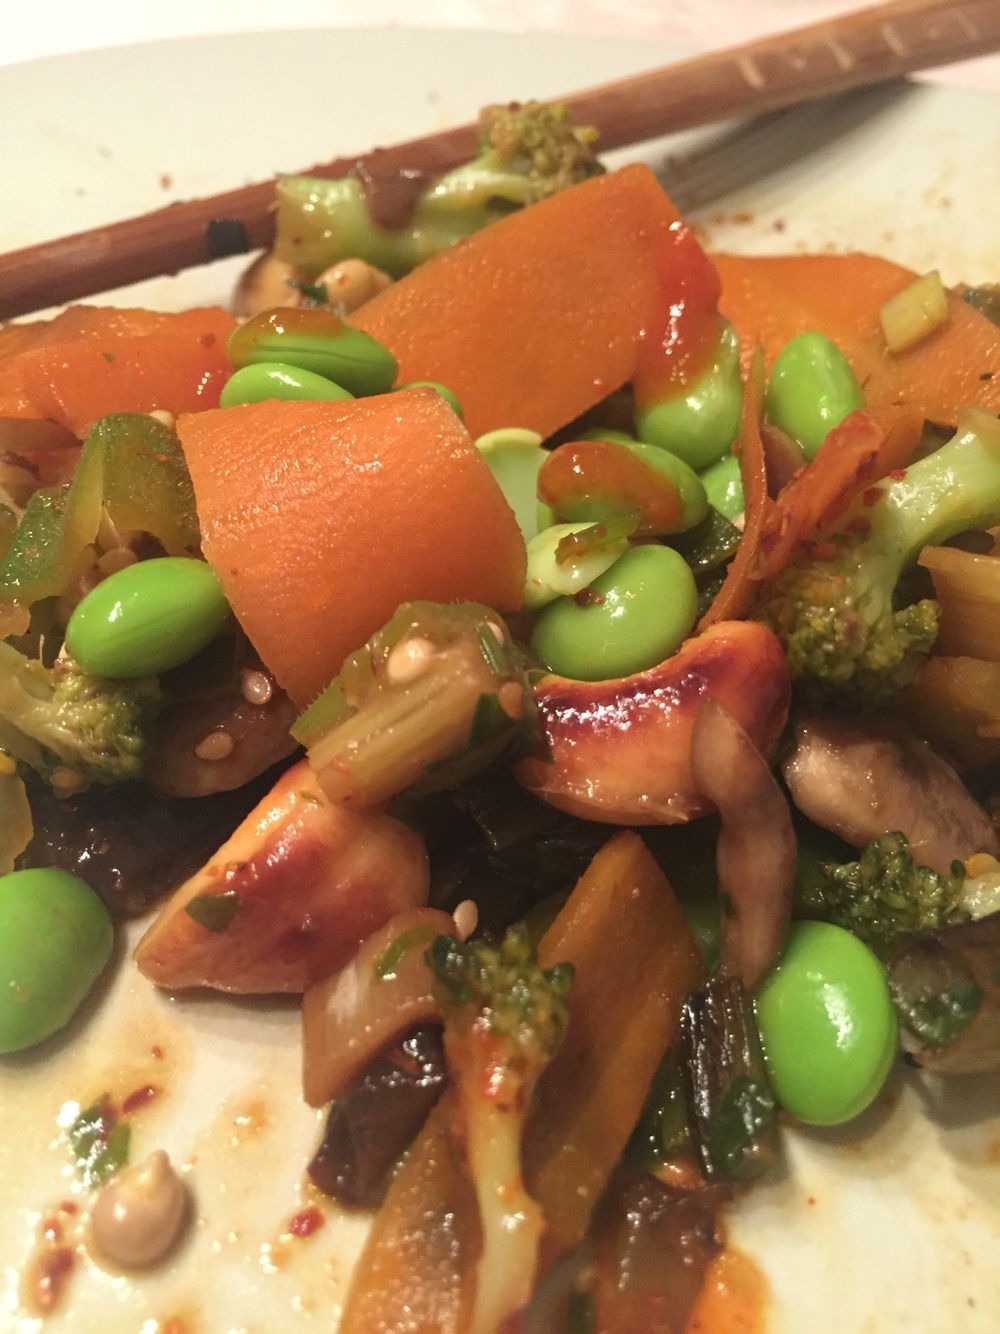 Wok 2 Pax 2 zanahorias  100 shitake 1 puñadoTirabeque 6 Okra 1 Pimiento verde  1/4 Broccoli 100gr Anacardos  8 Ajetes  Edamame  Cilantro  Tamari Tajin Sriracha  Especias Wok Sésamo Lima